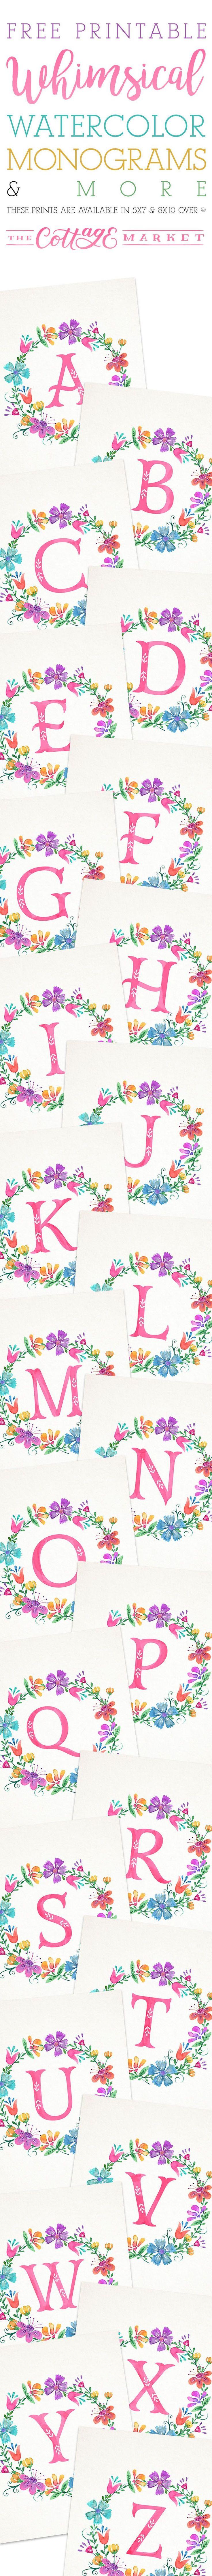 Free Printable Whimsical Watercolor Monograms